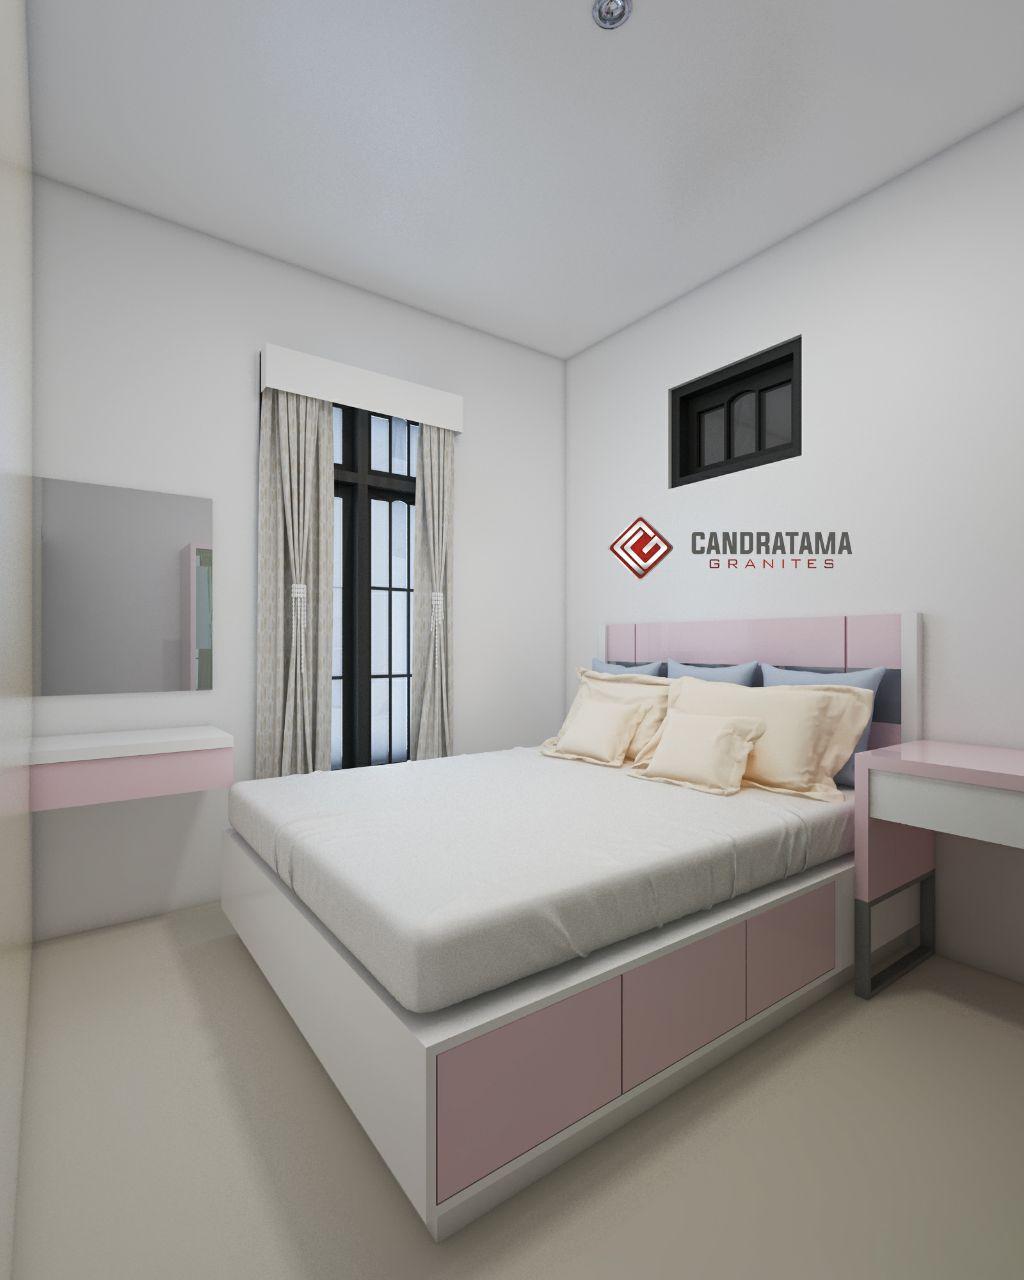 5 Tips Desain Kamar Tidur Minimalis Interior Nganjuk 082183260005